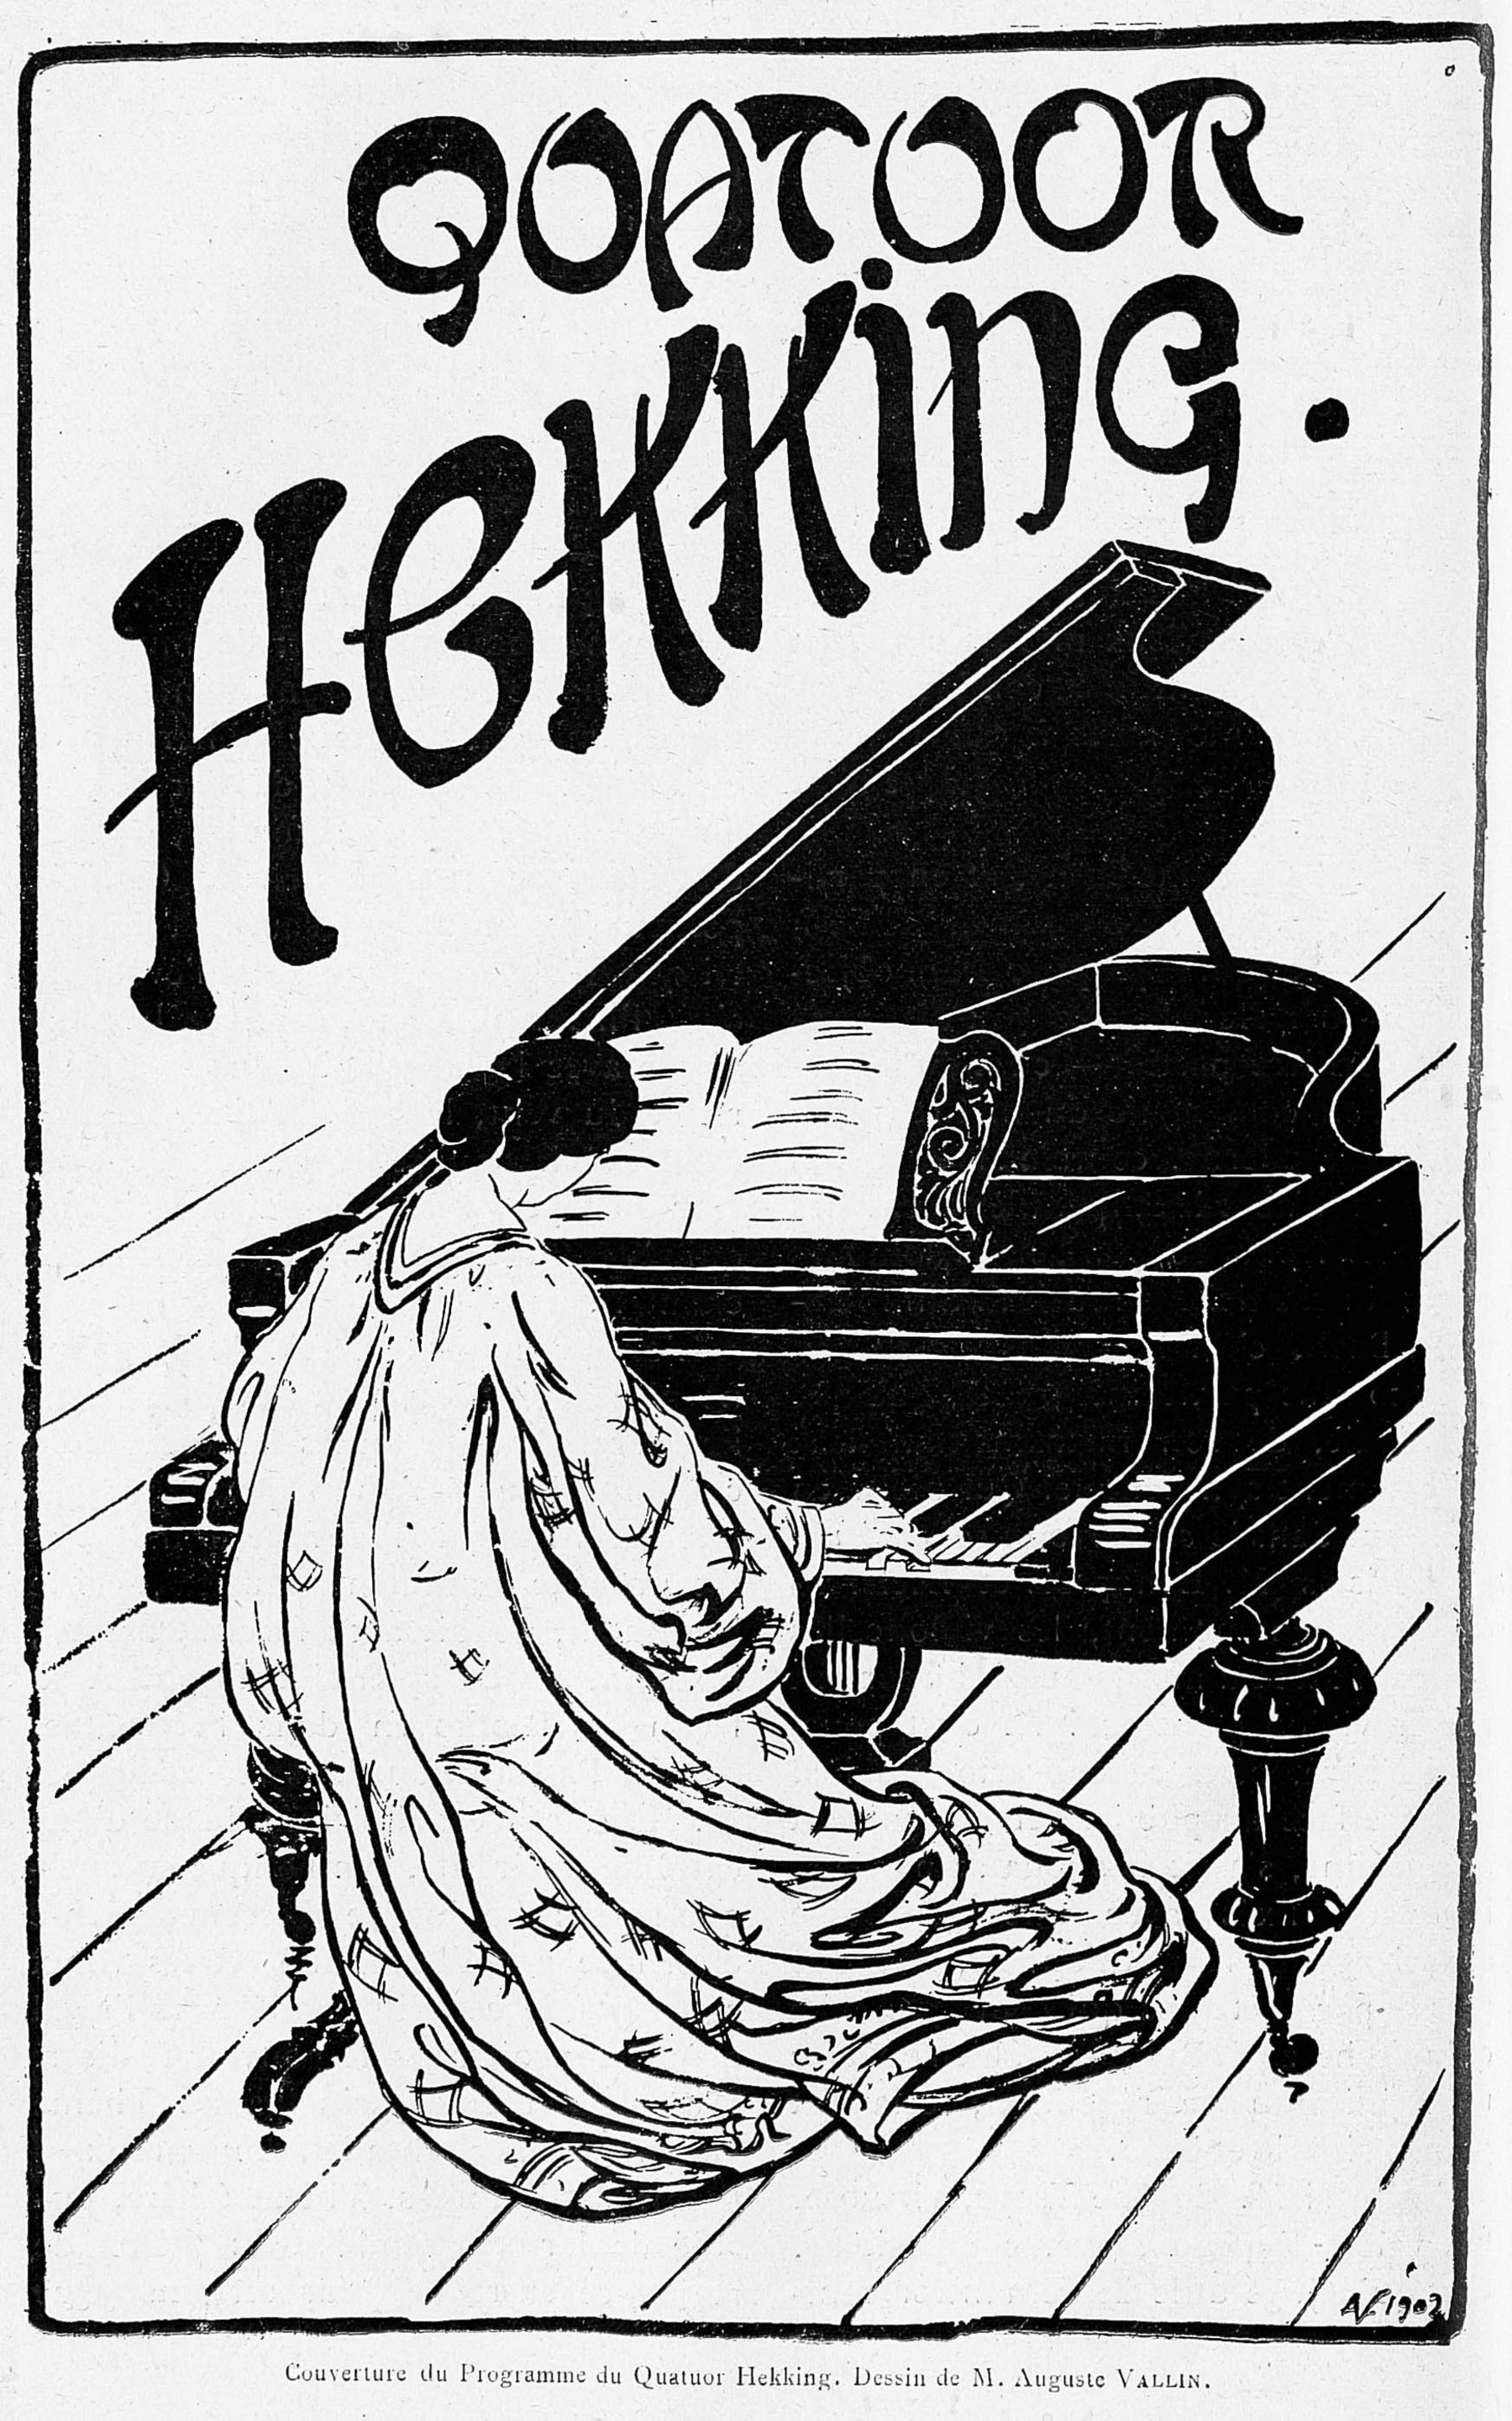 Contenu du Quatuor Hekking